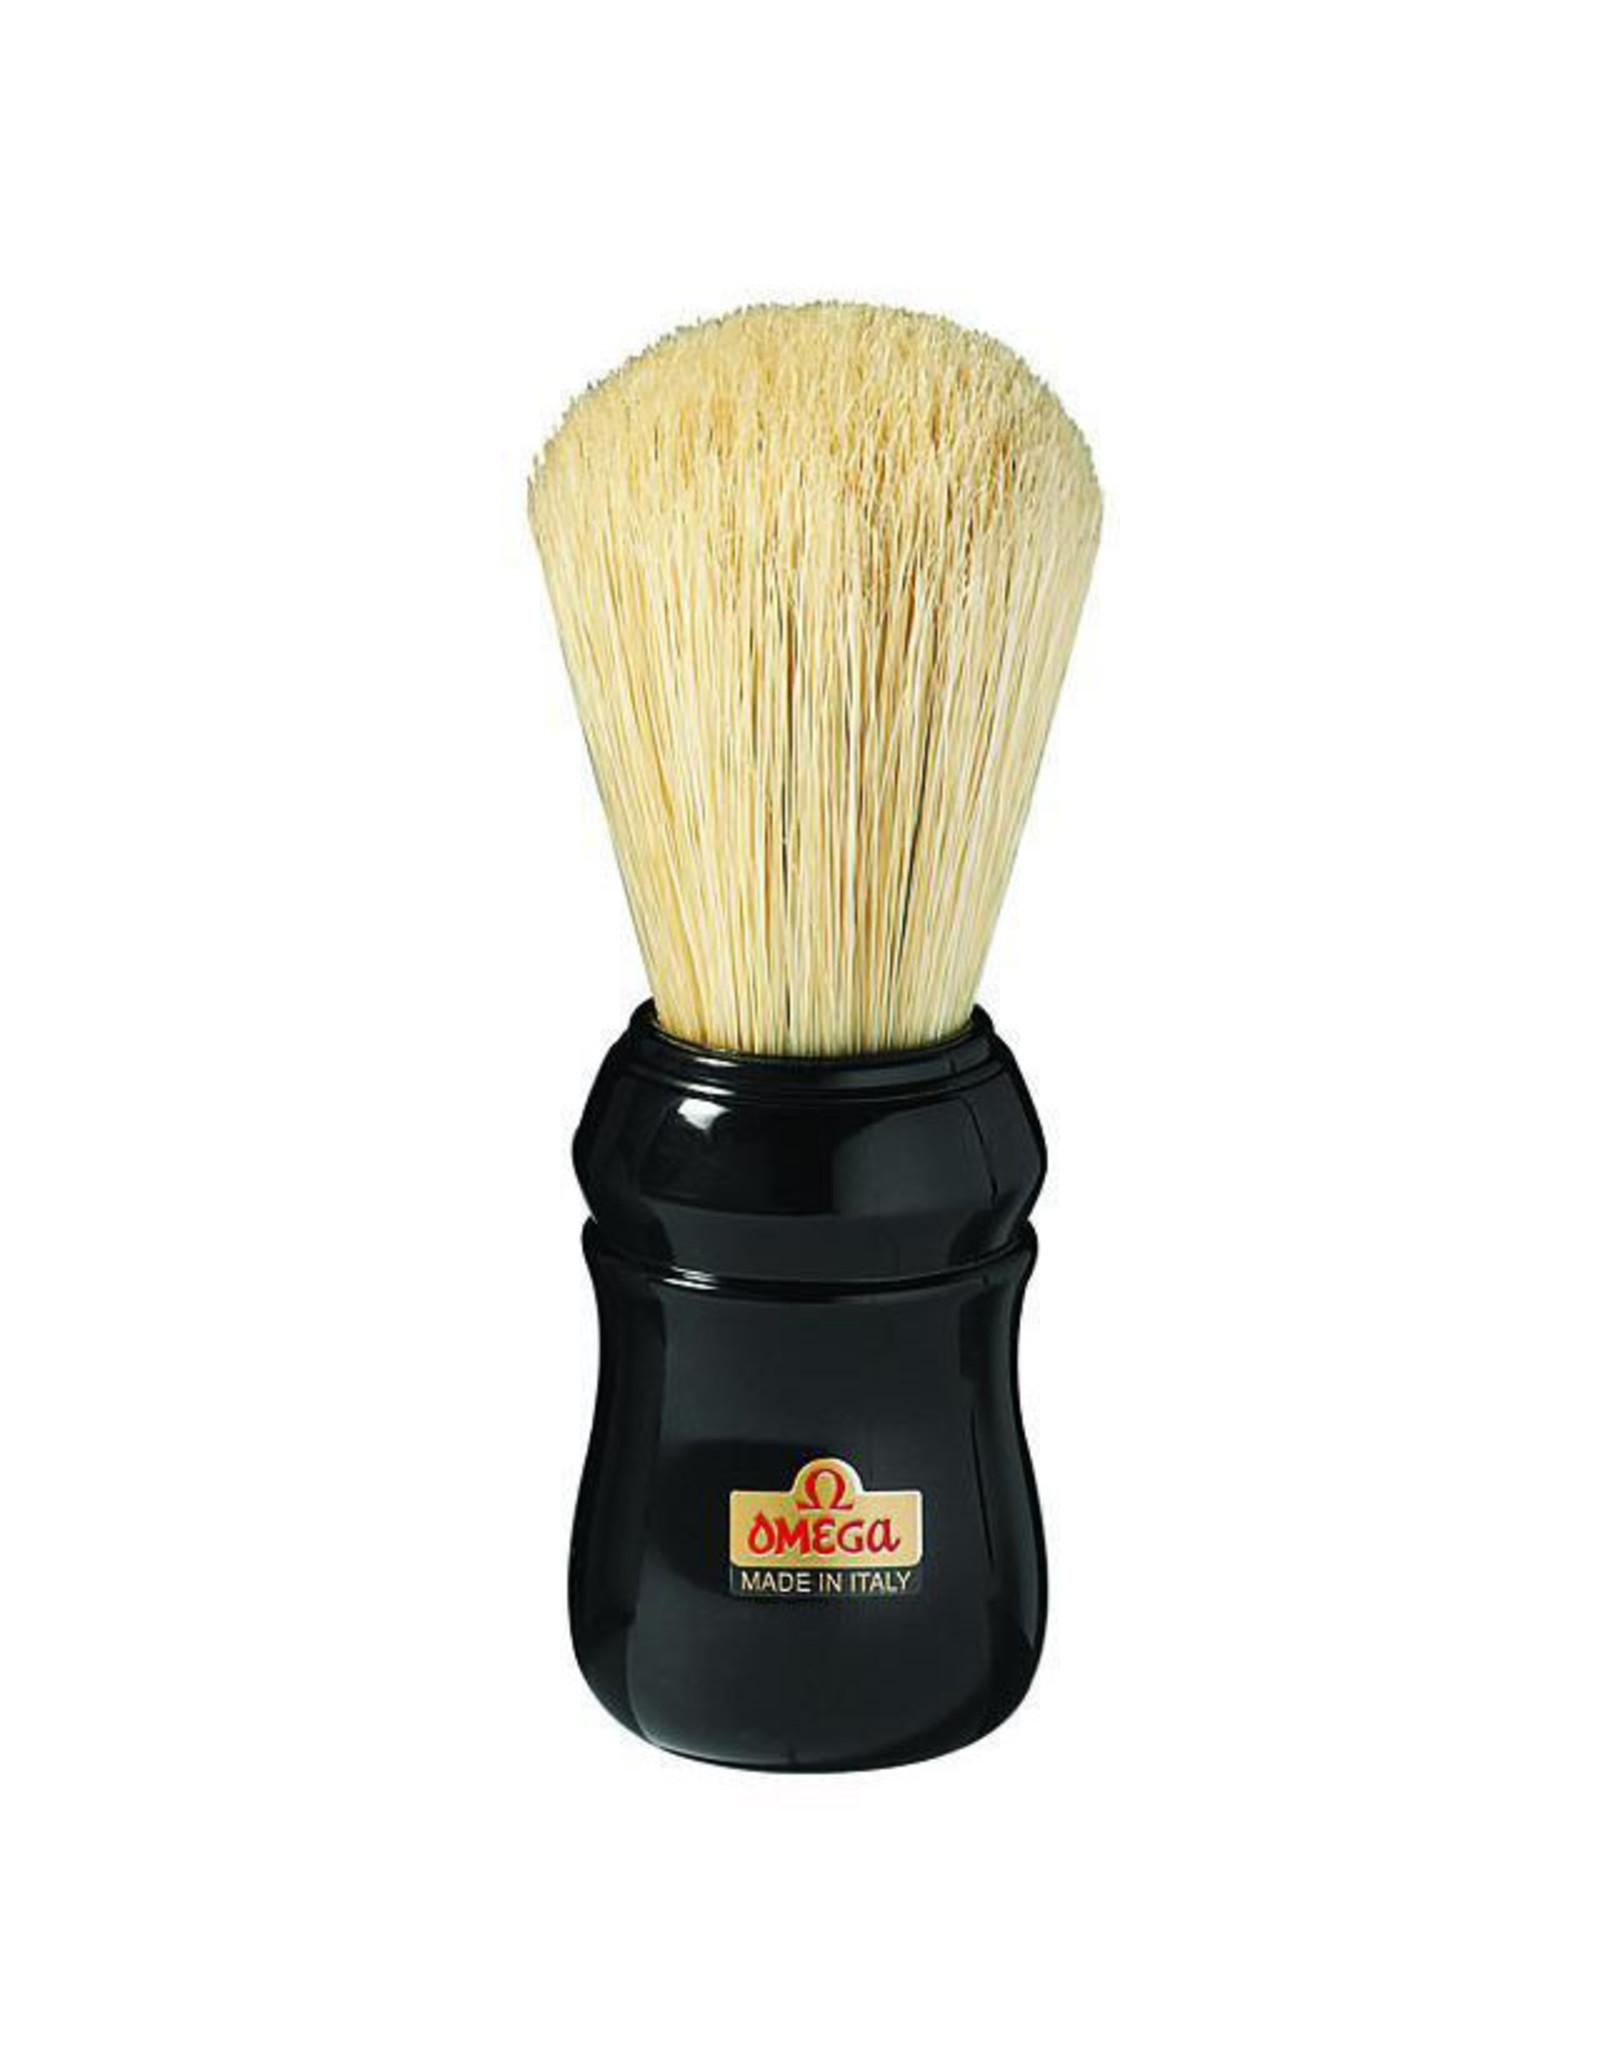 Omega Boar Bristle Shaving Brush, ABS Handle, Black